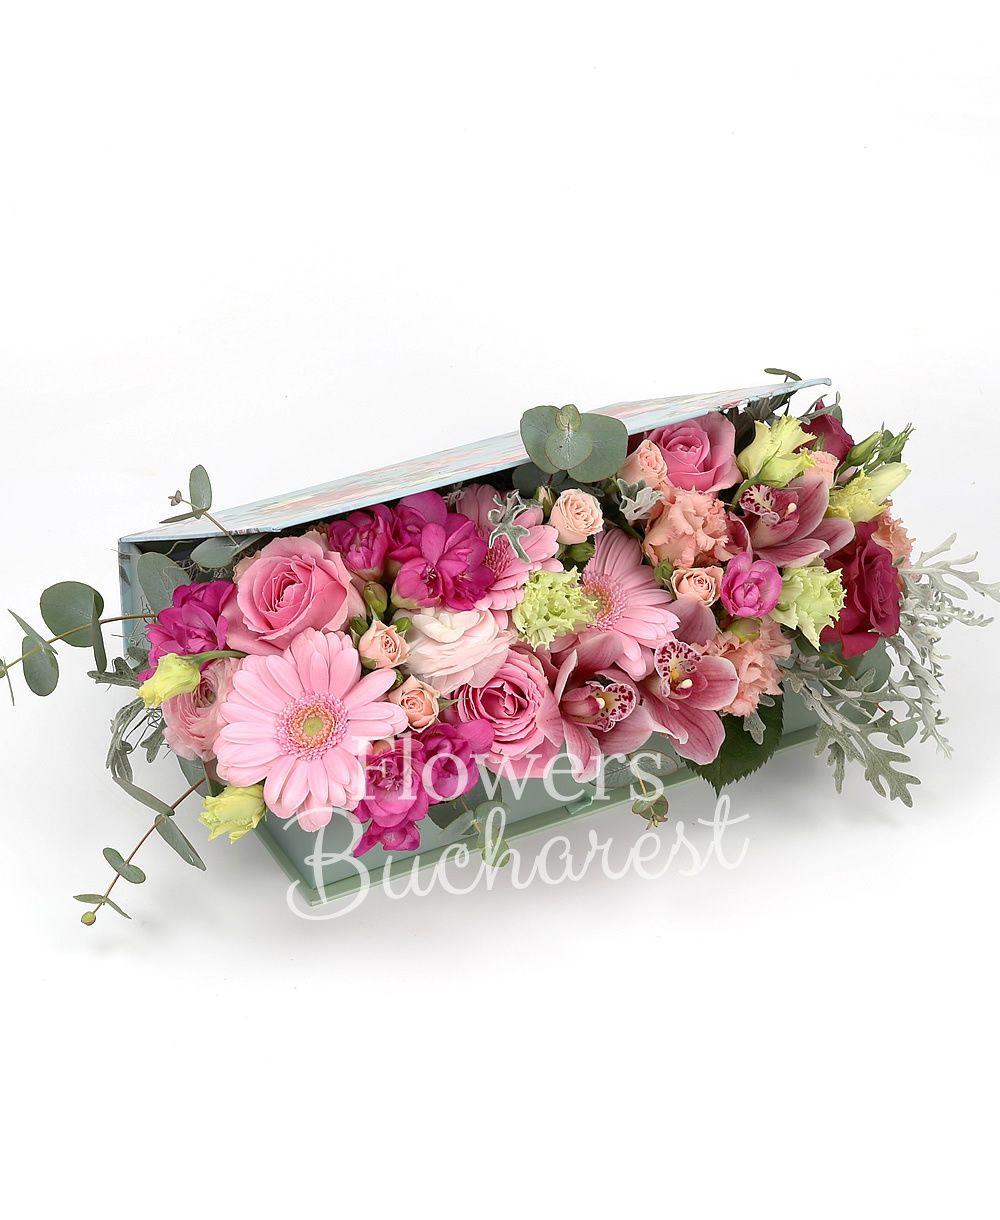 3 pink roses, 2 cymbidium roses, 3 pink gerberas, 3 pink miniroses, 3 pink lisianthus, 5 cyclam freesias, 3 pink ranunculus, pink cymbidium, greenery